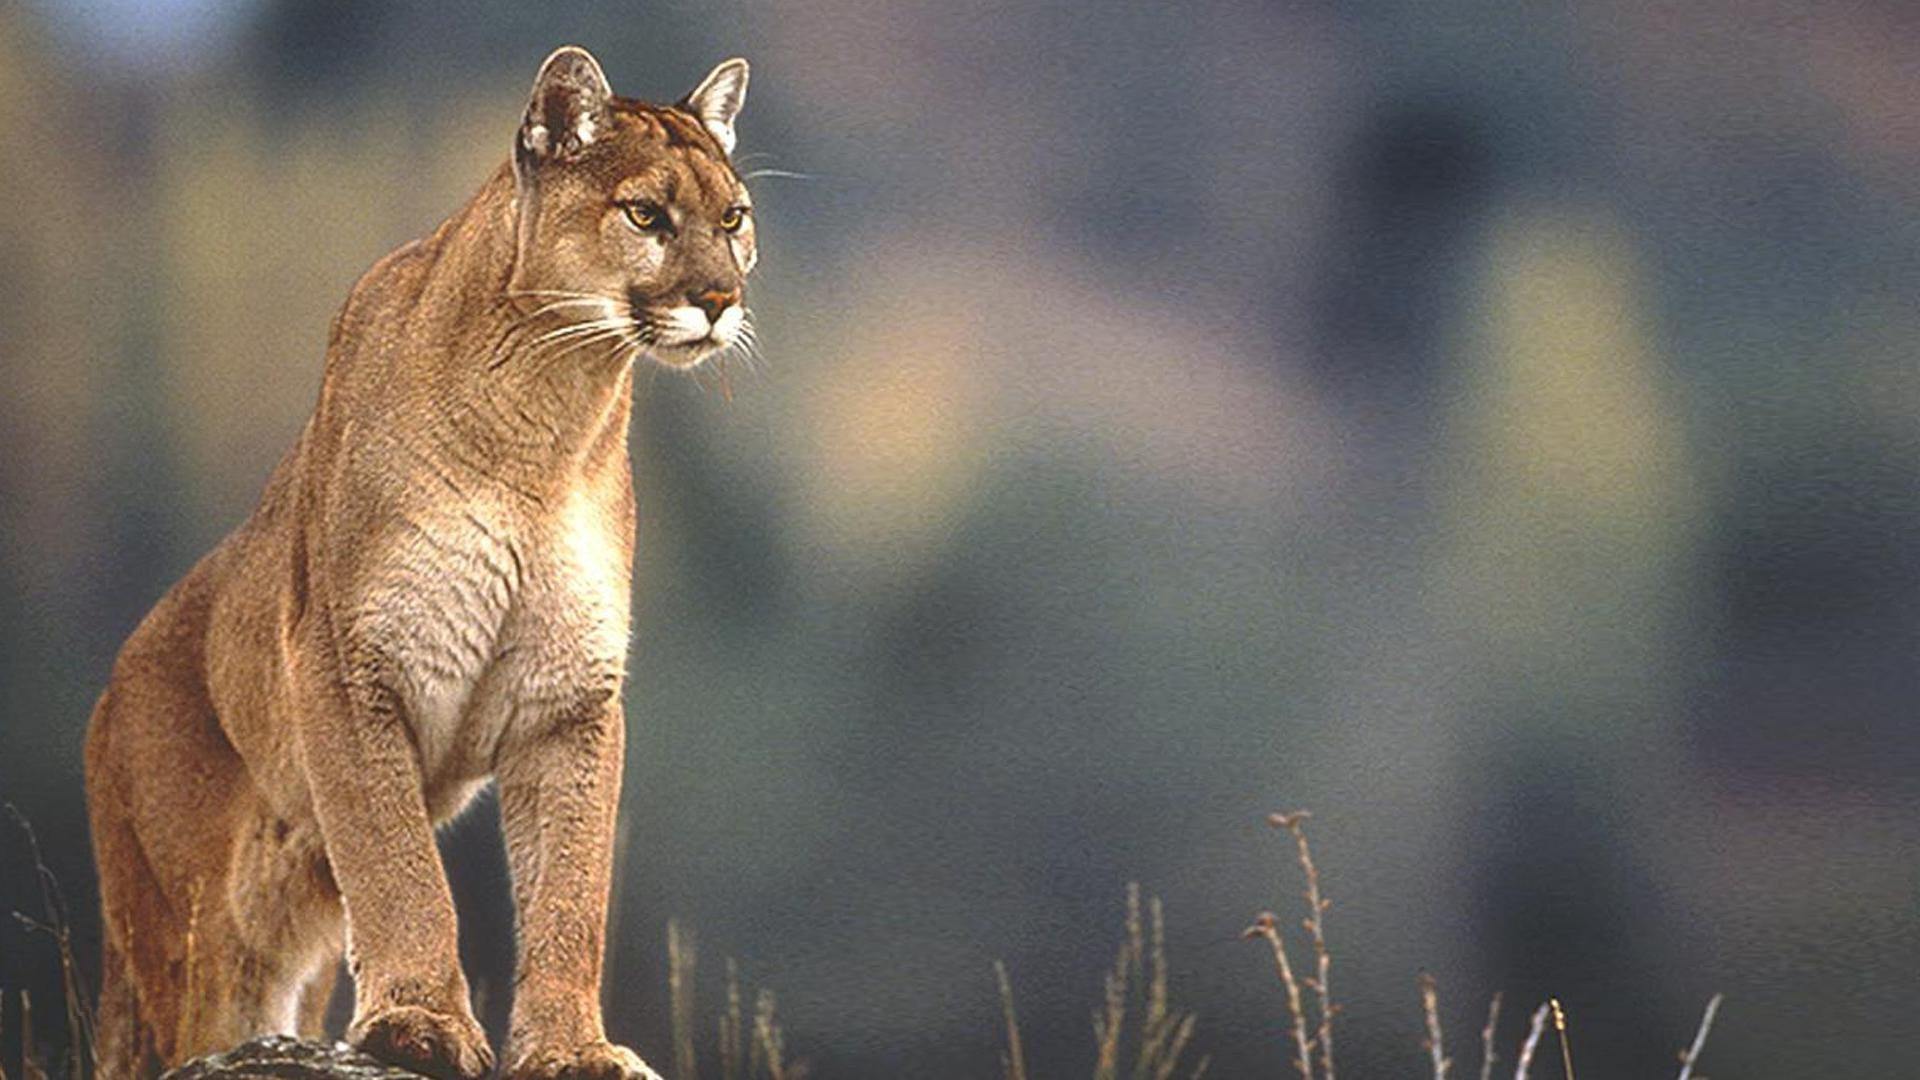 Cougar Hd wallpaper pc